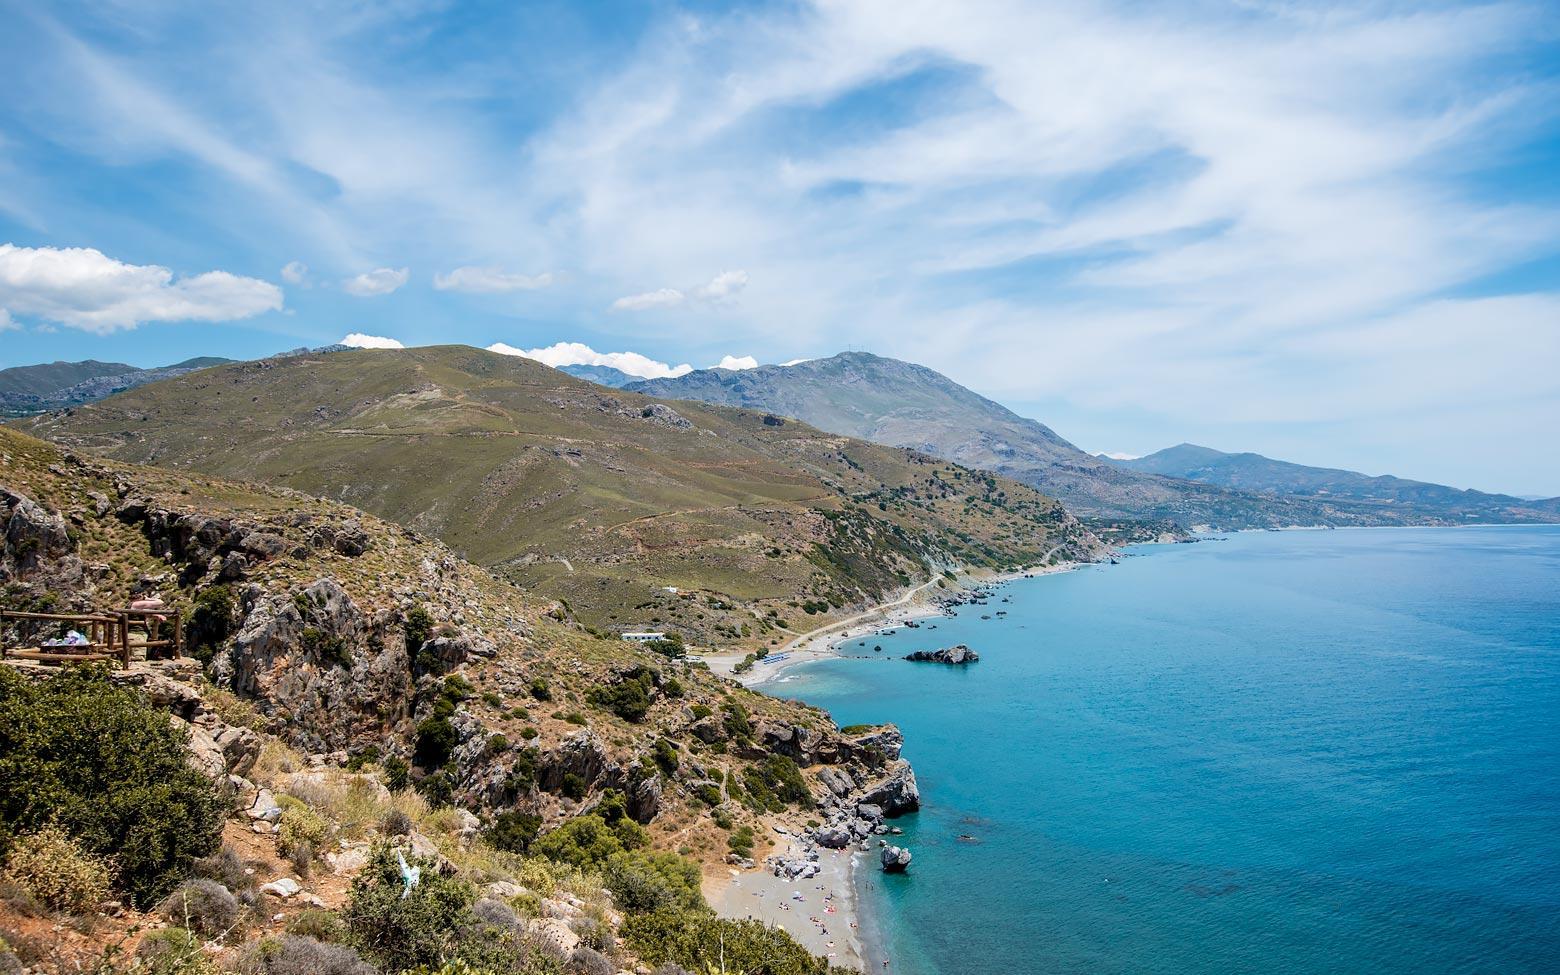 Island of Crete, Azure waters